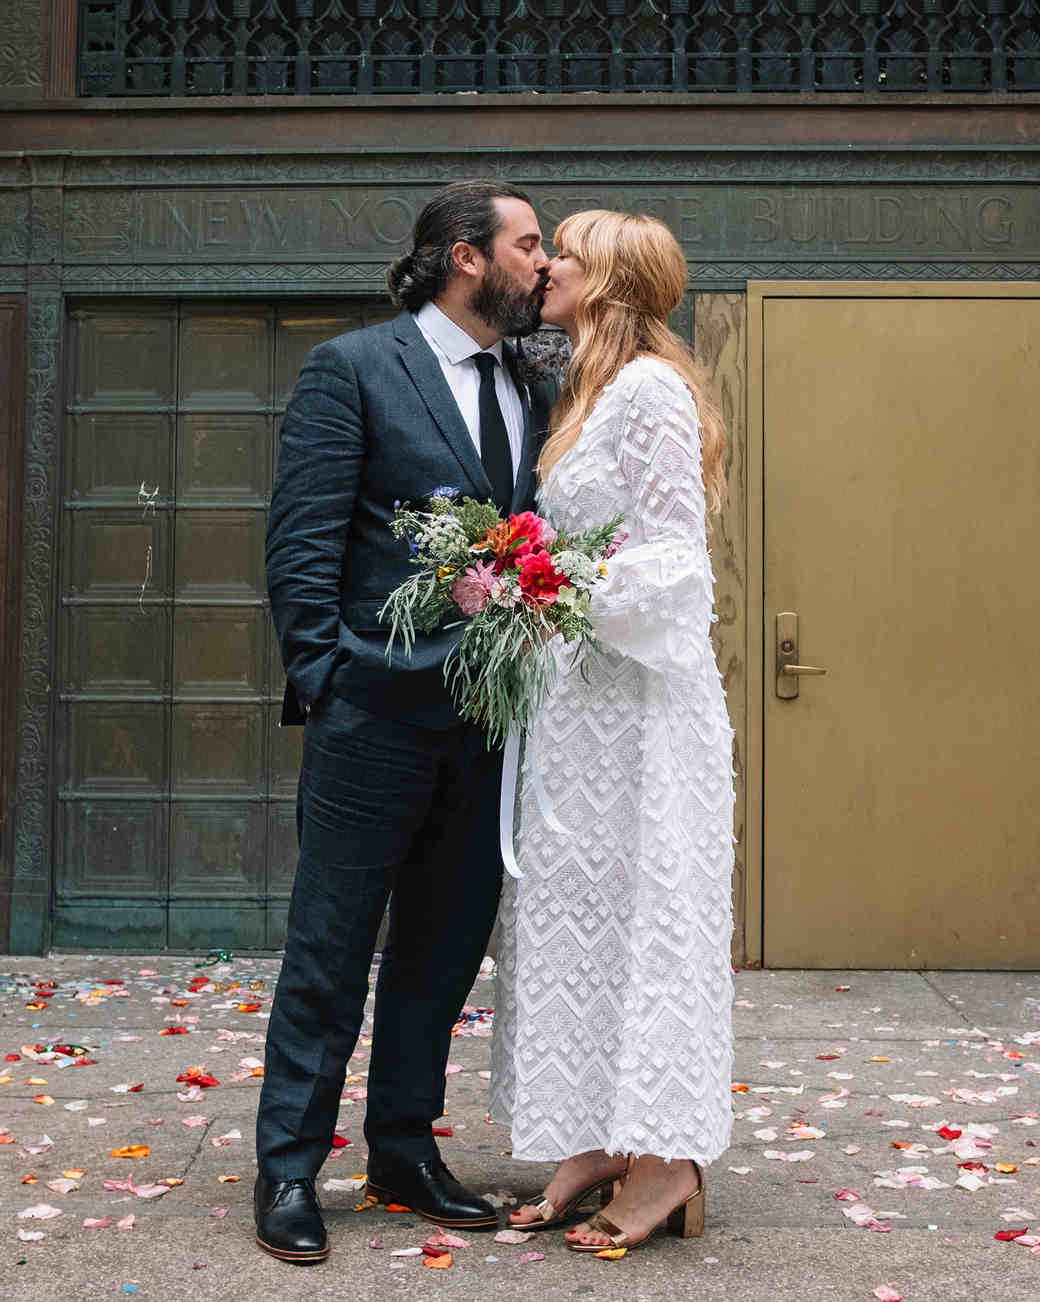 morgan jon paul wedding couple kissing